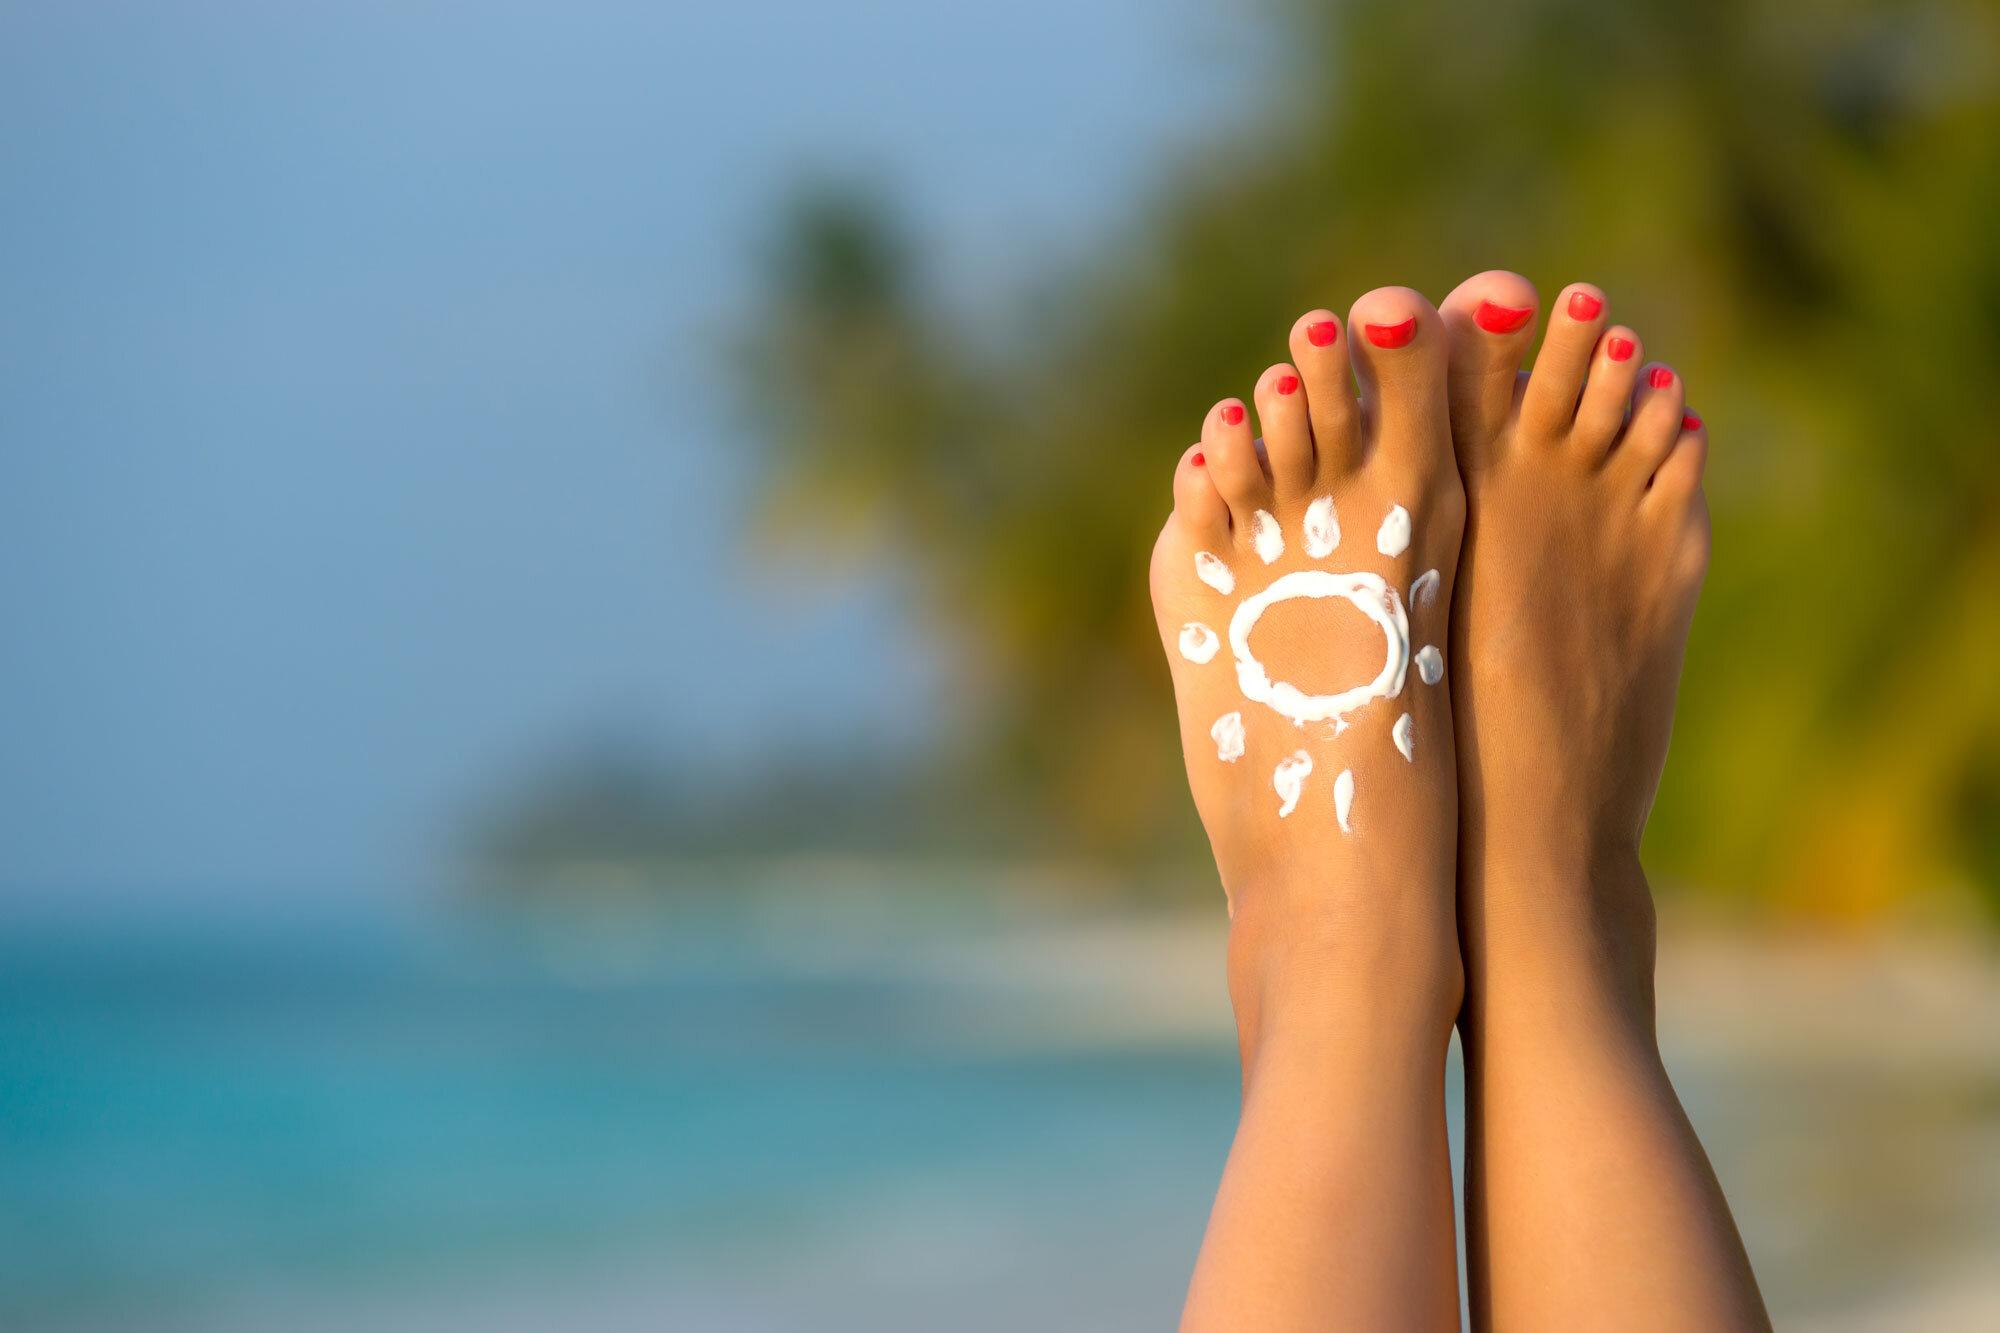 bigstock-Woman-s-Foot-With-Sun-shaped-S-83644250web.jpg